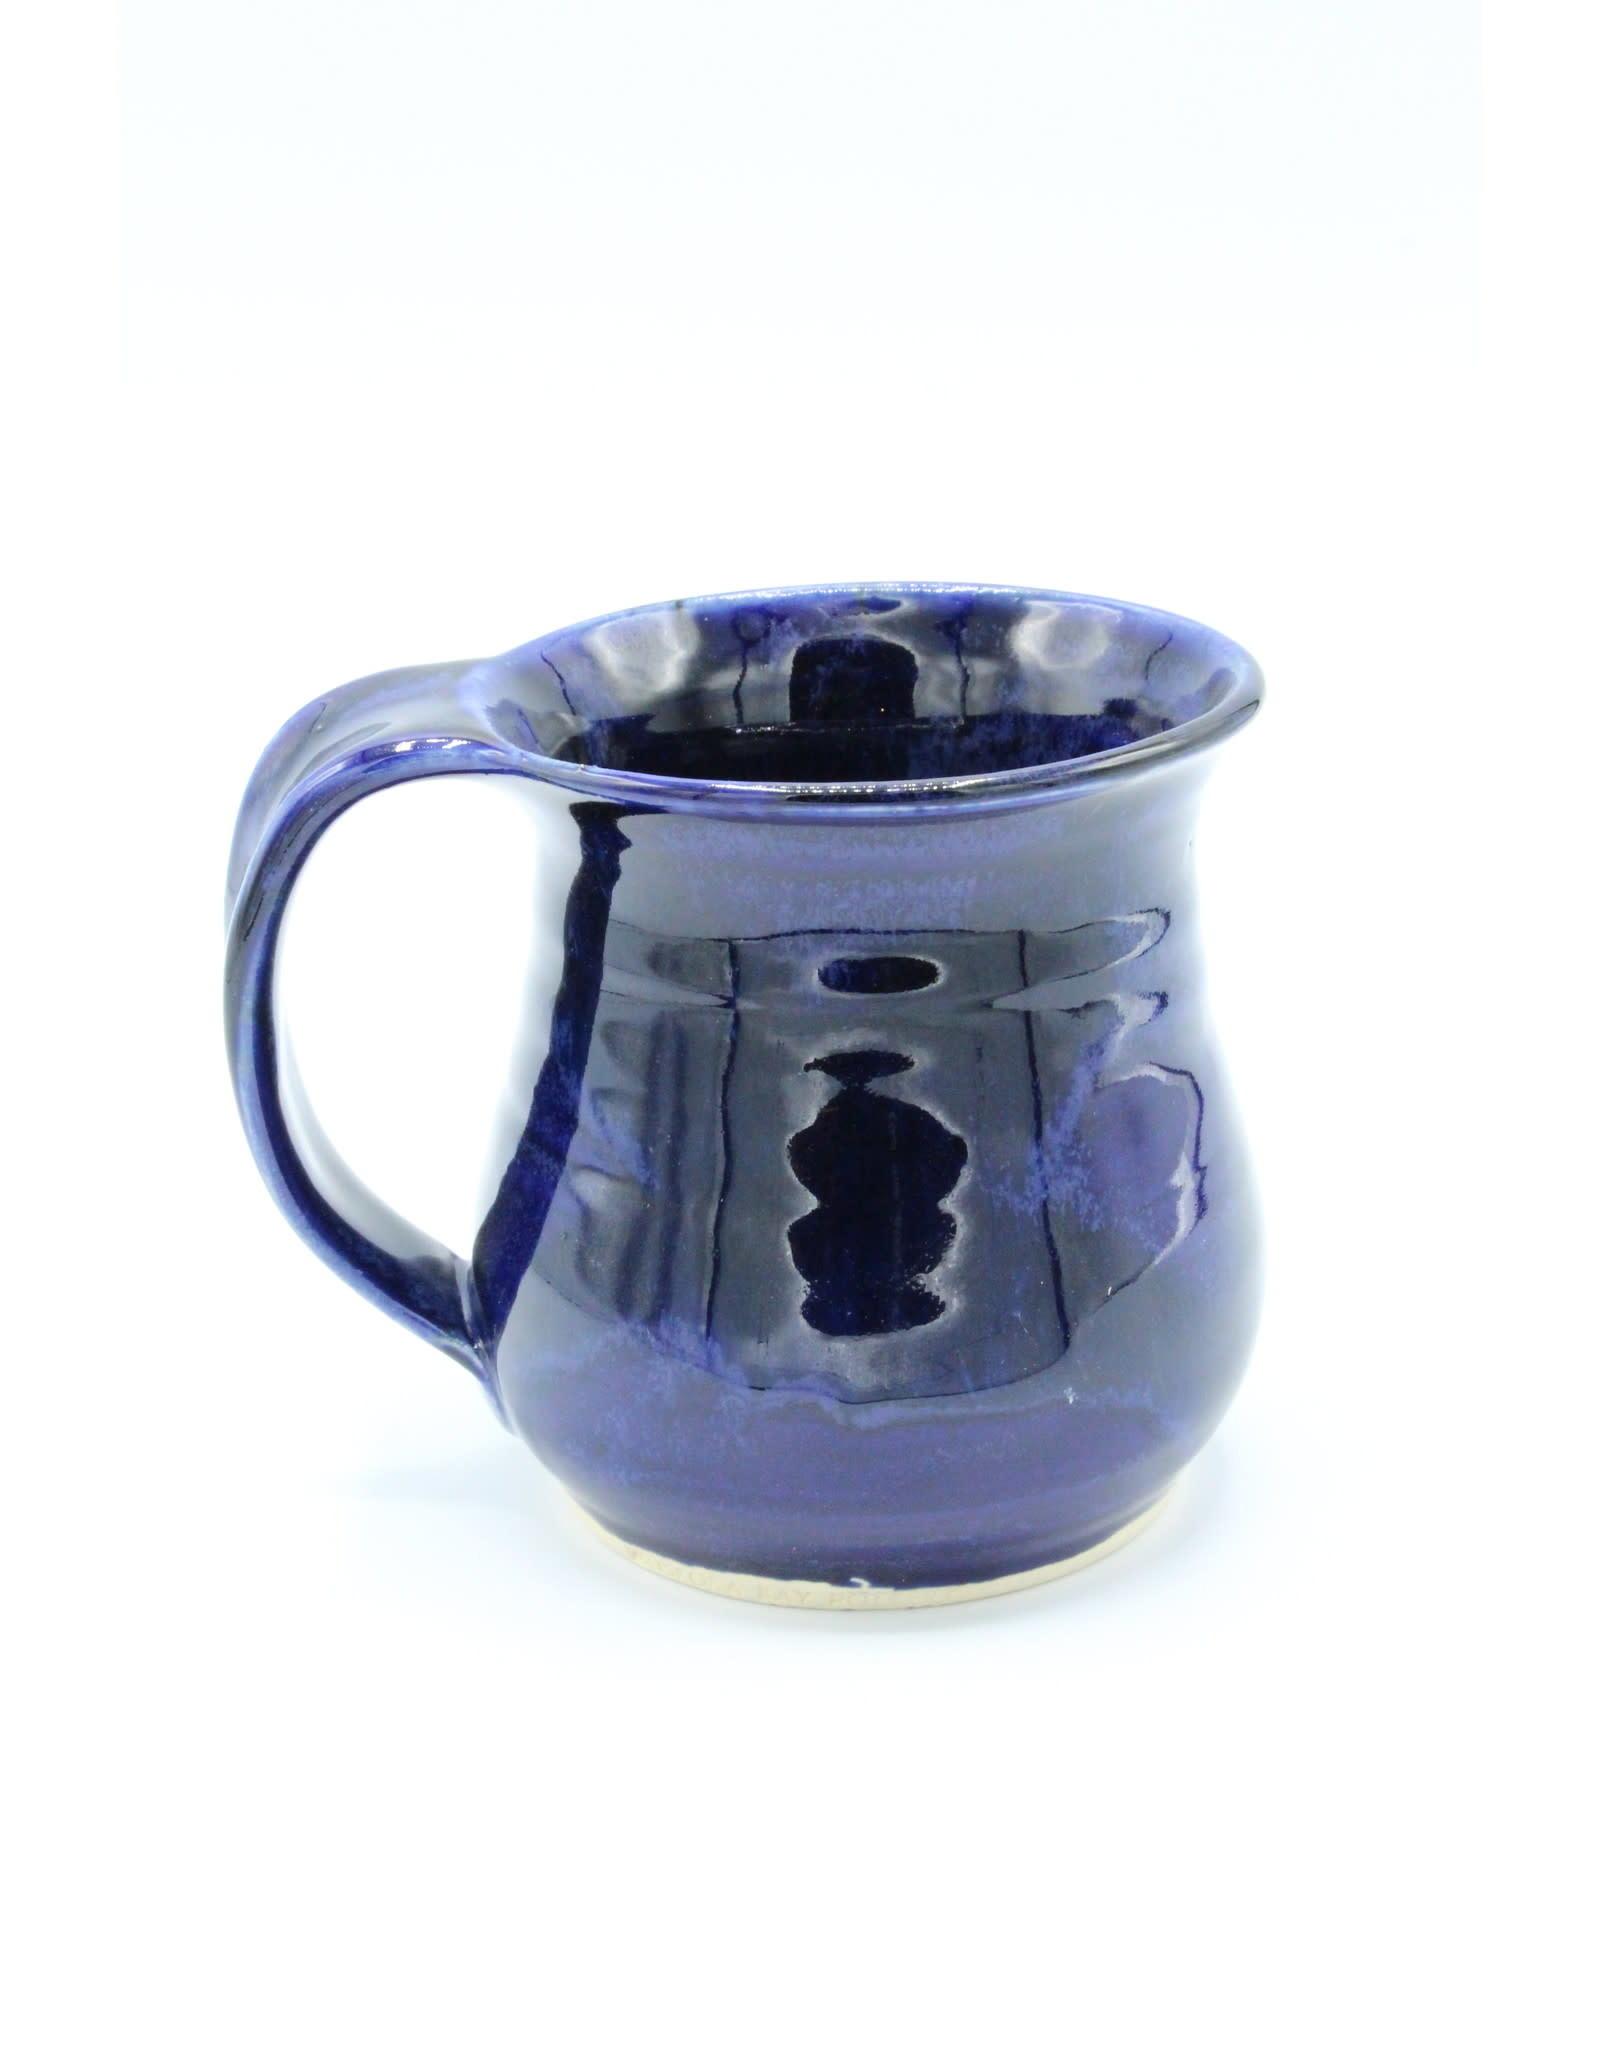 Potbelly Mug - Cobalt